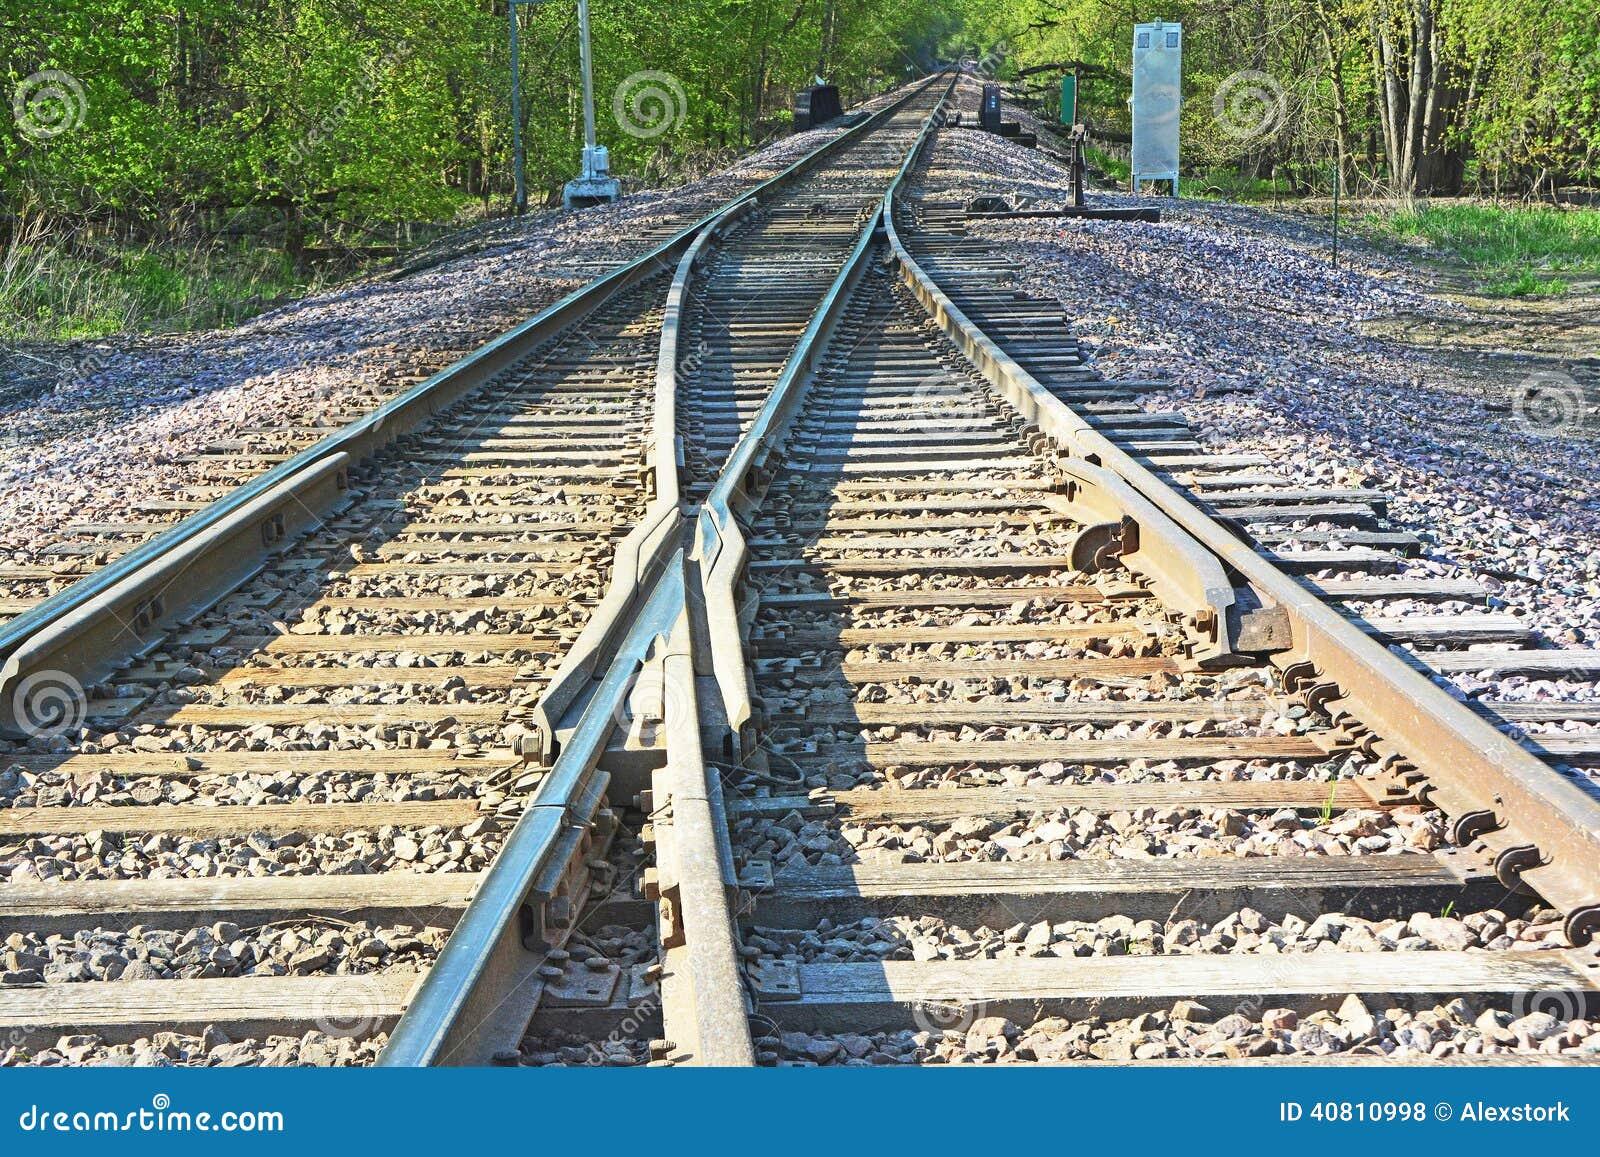 Photo of Railroad Track · Free Stock Photo